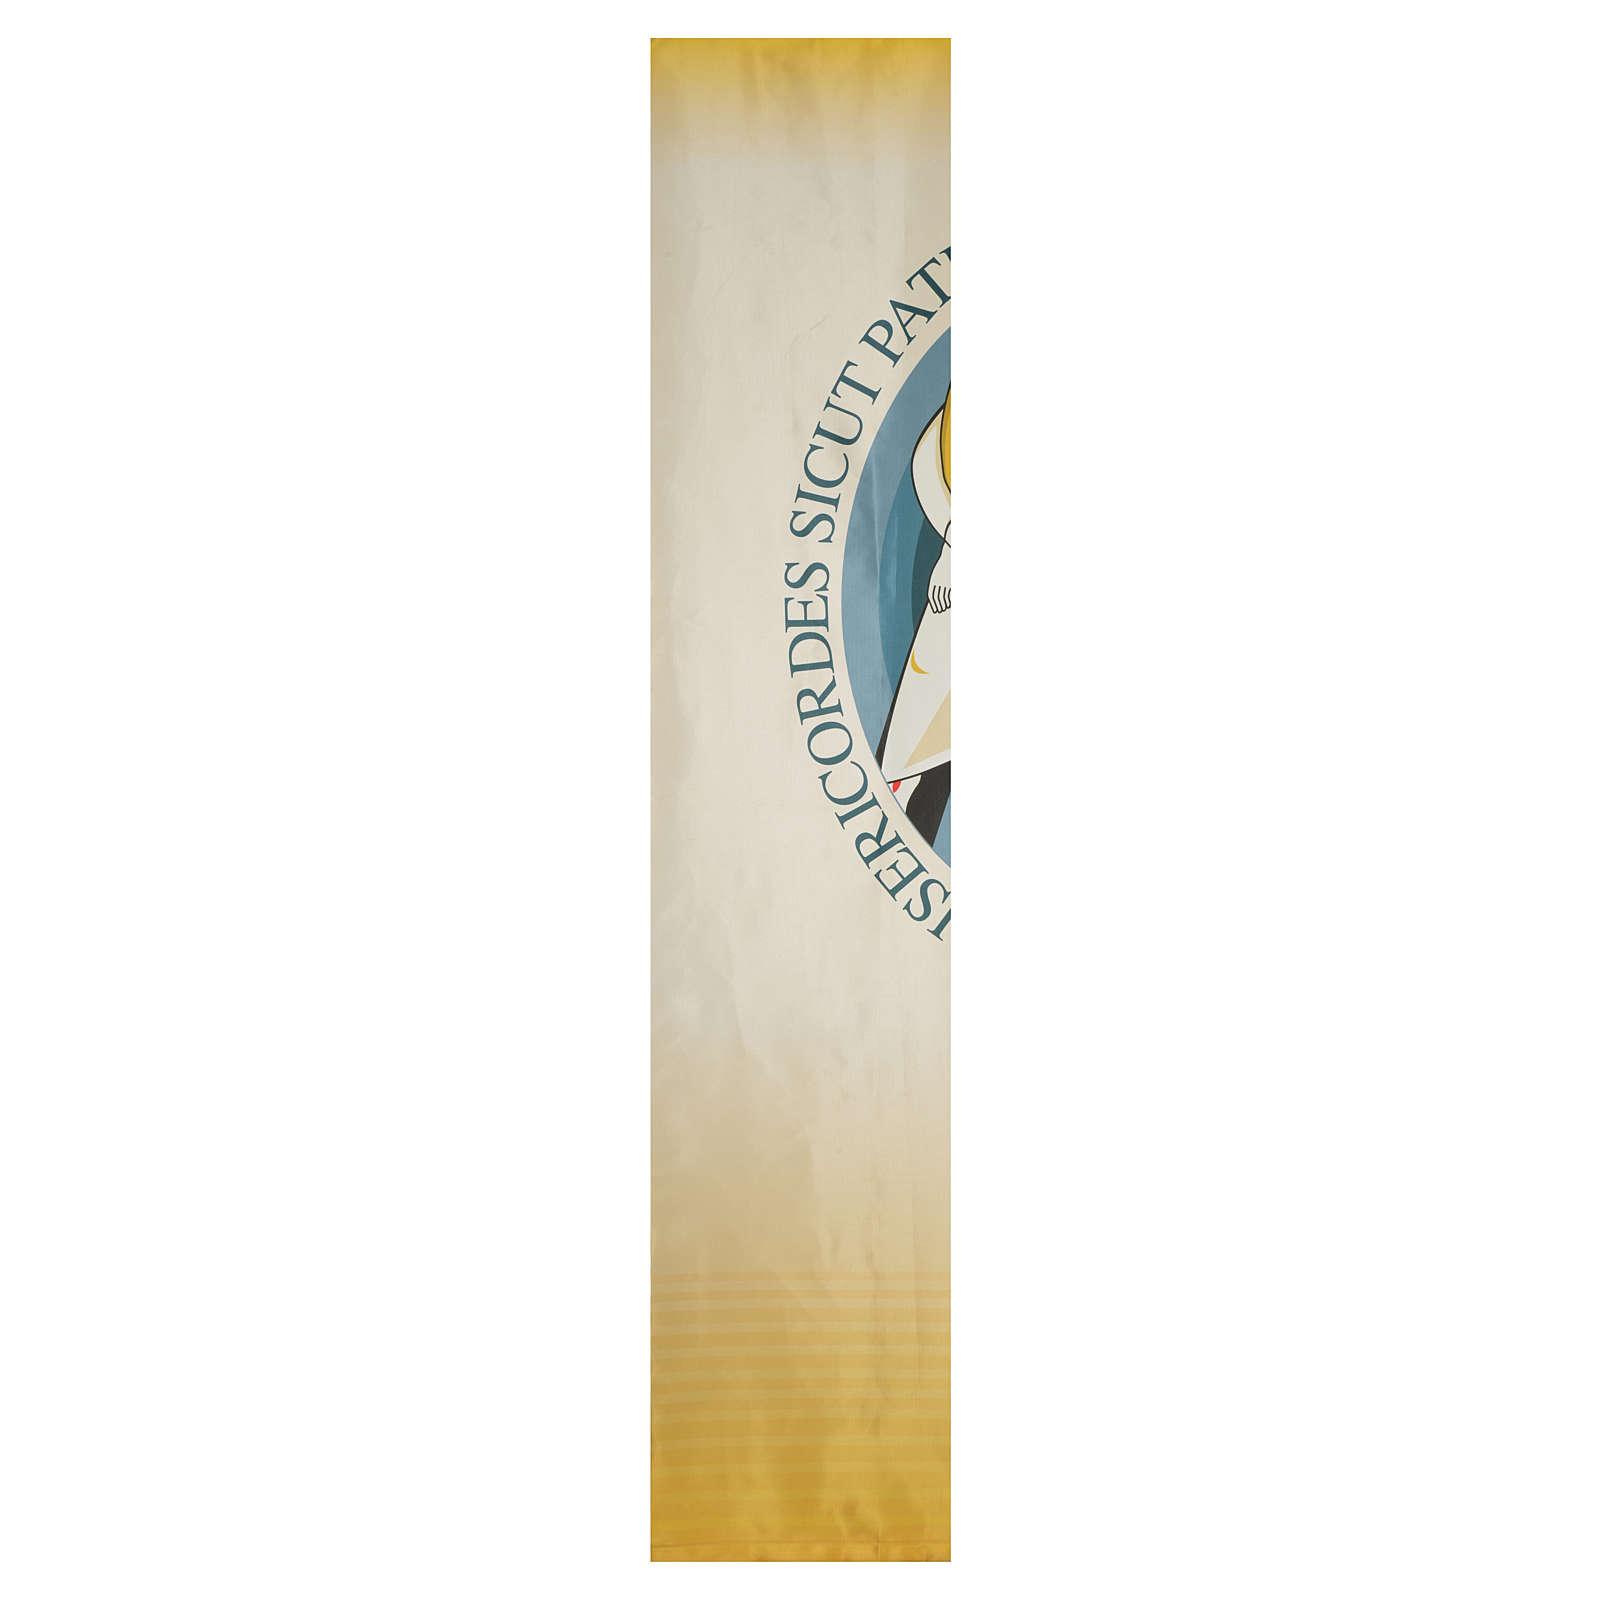 STOCK Símbolo Jubileu Misericórdia LATIM tecido 90x200 cm impressão 3